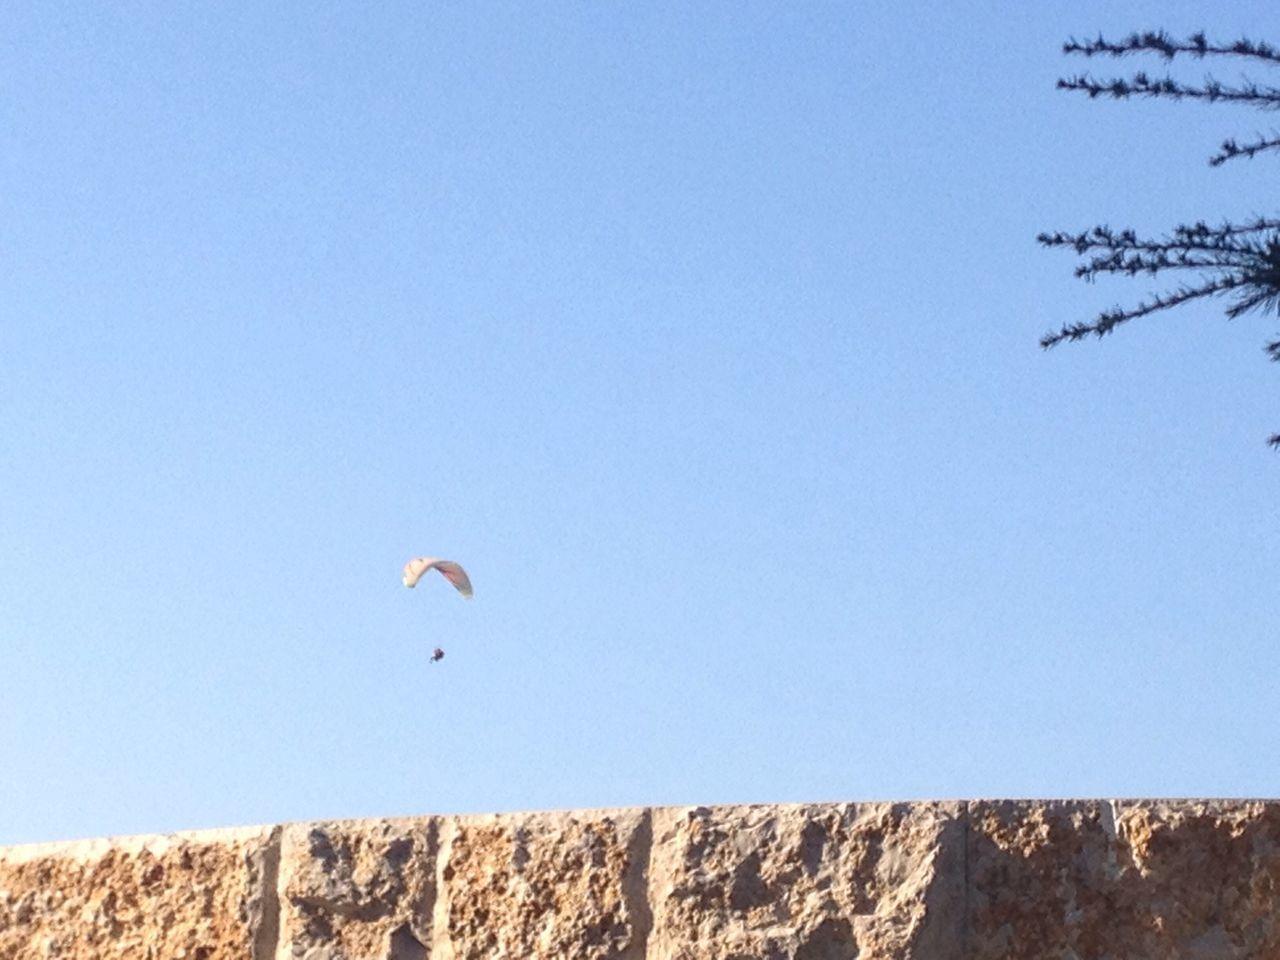 Lebanon Clear Sky Blue Blue Sky Harrisa Parasailing